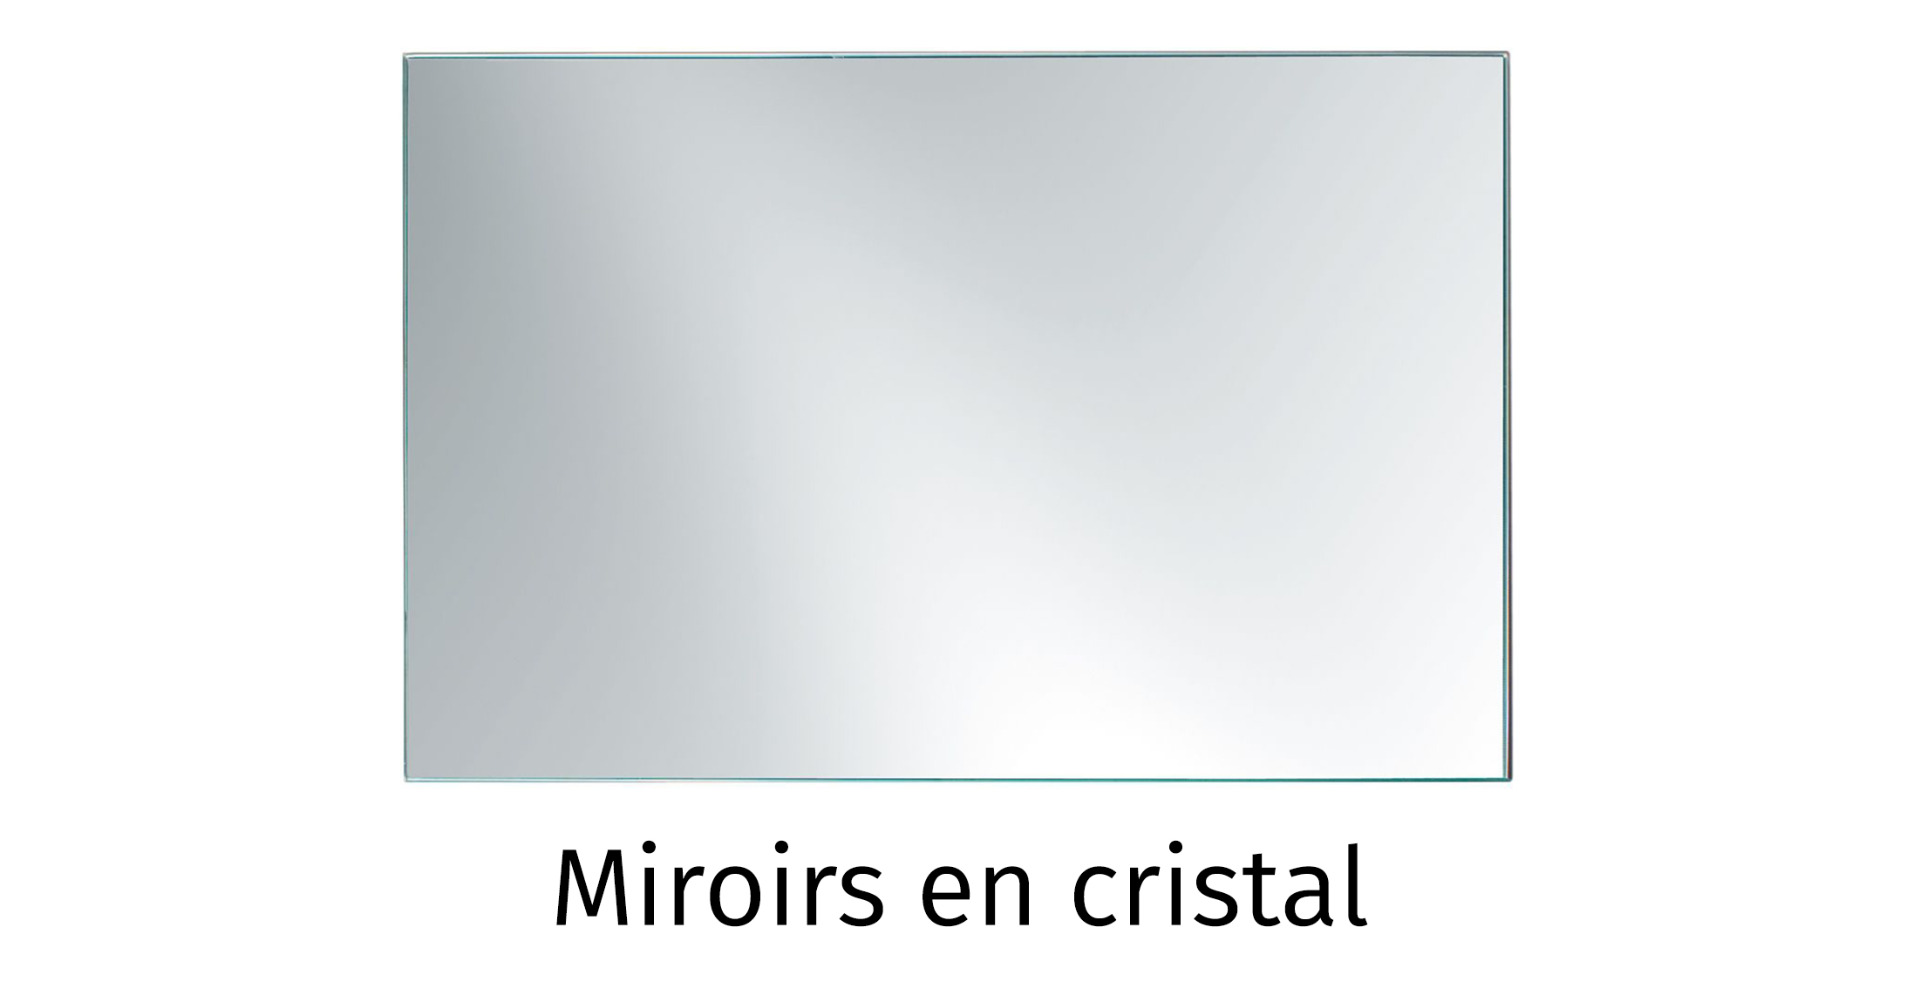 Miroirs en cristal